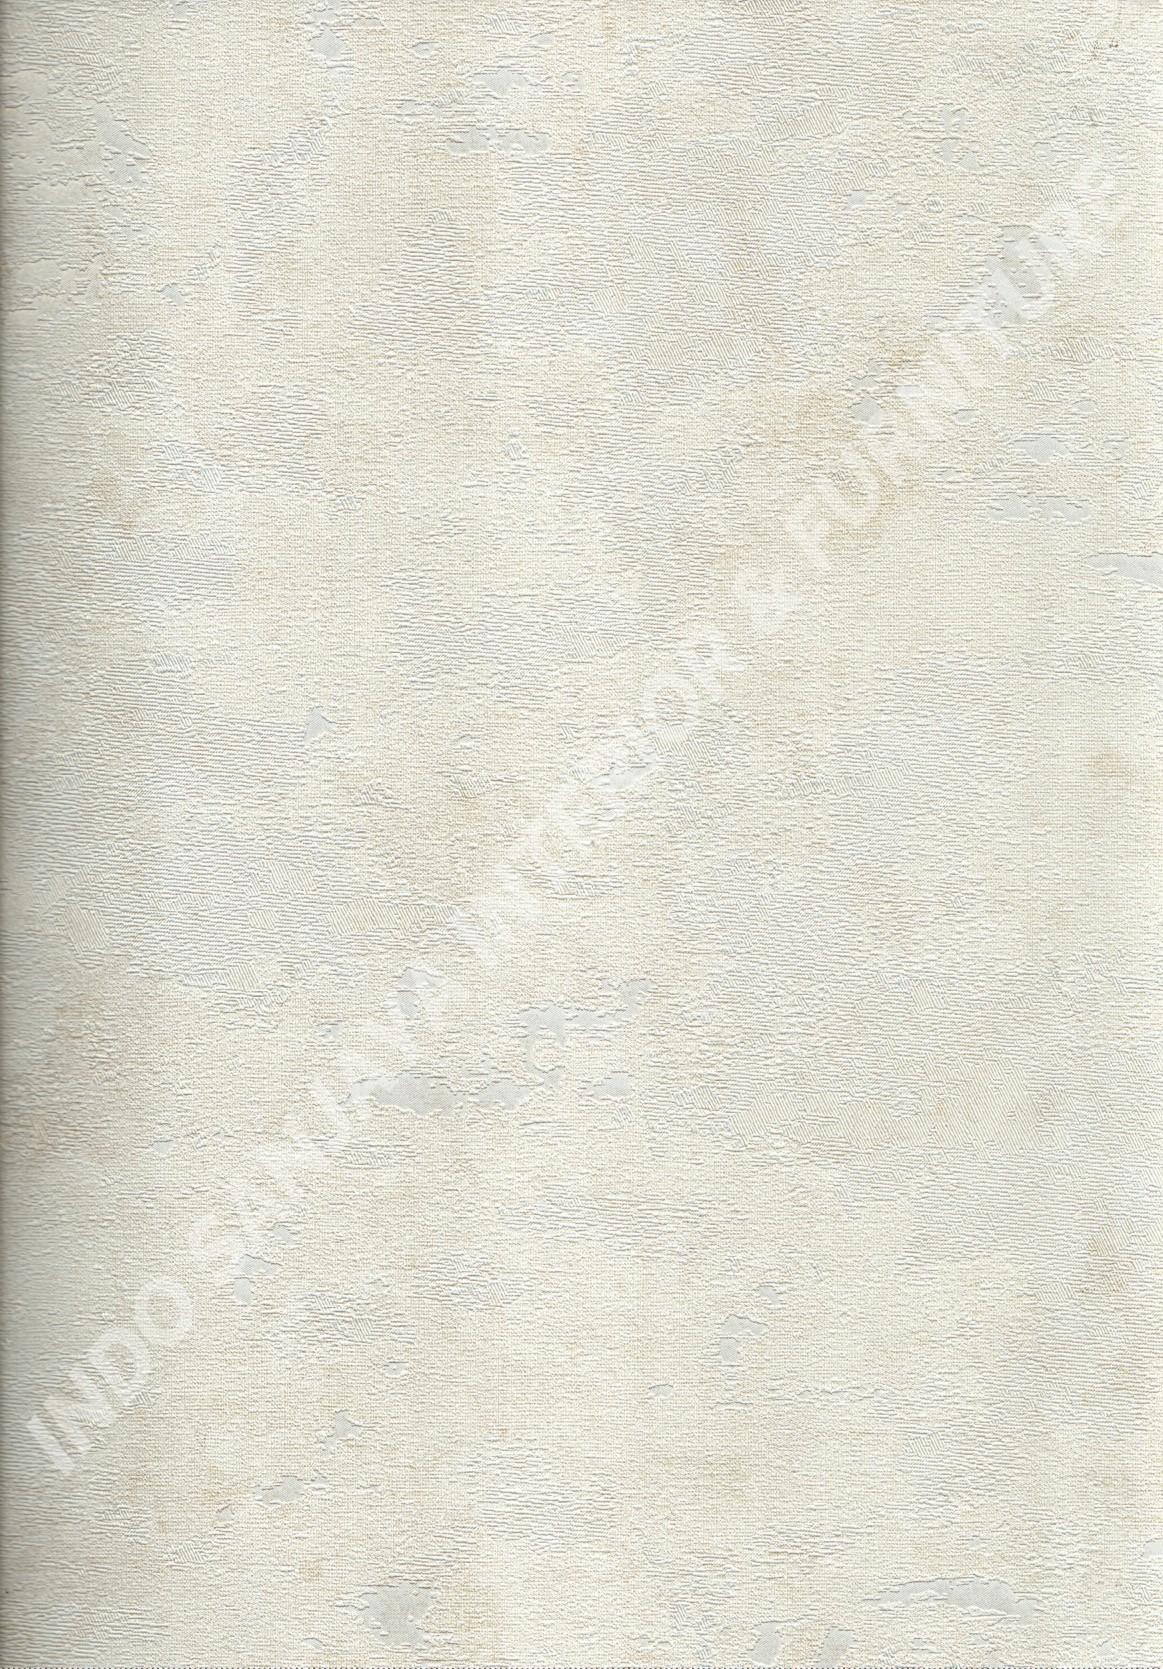 wallpaper   Wallpaper Minimalis Polos 5007-1:5007-1 corak  warna